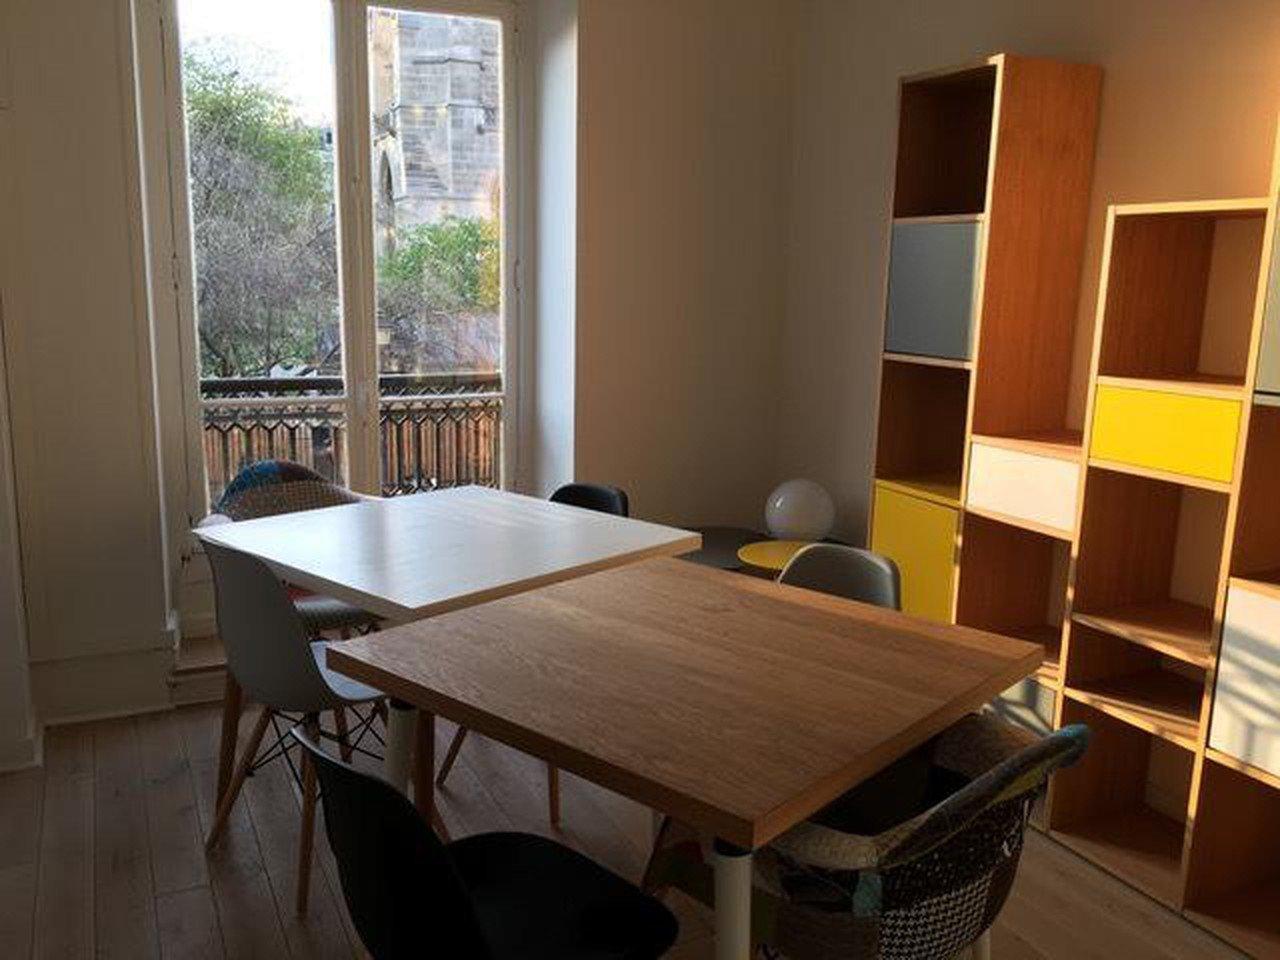 Paris Espaces de travail Meeting room Cosy Corner small Chatelet image 4